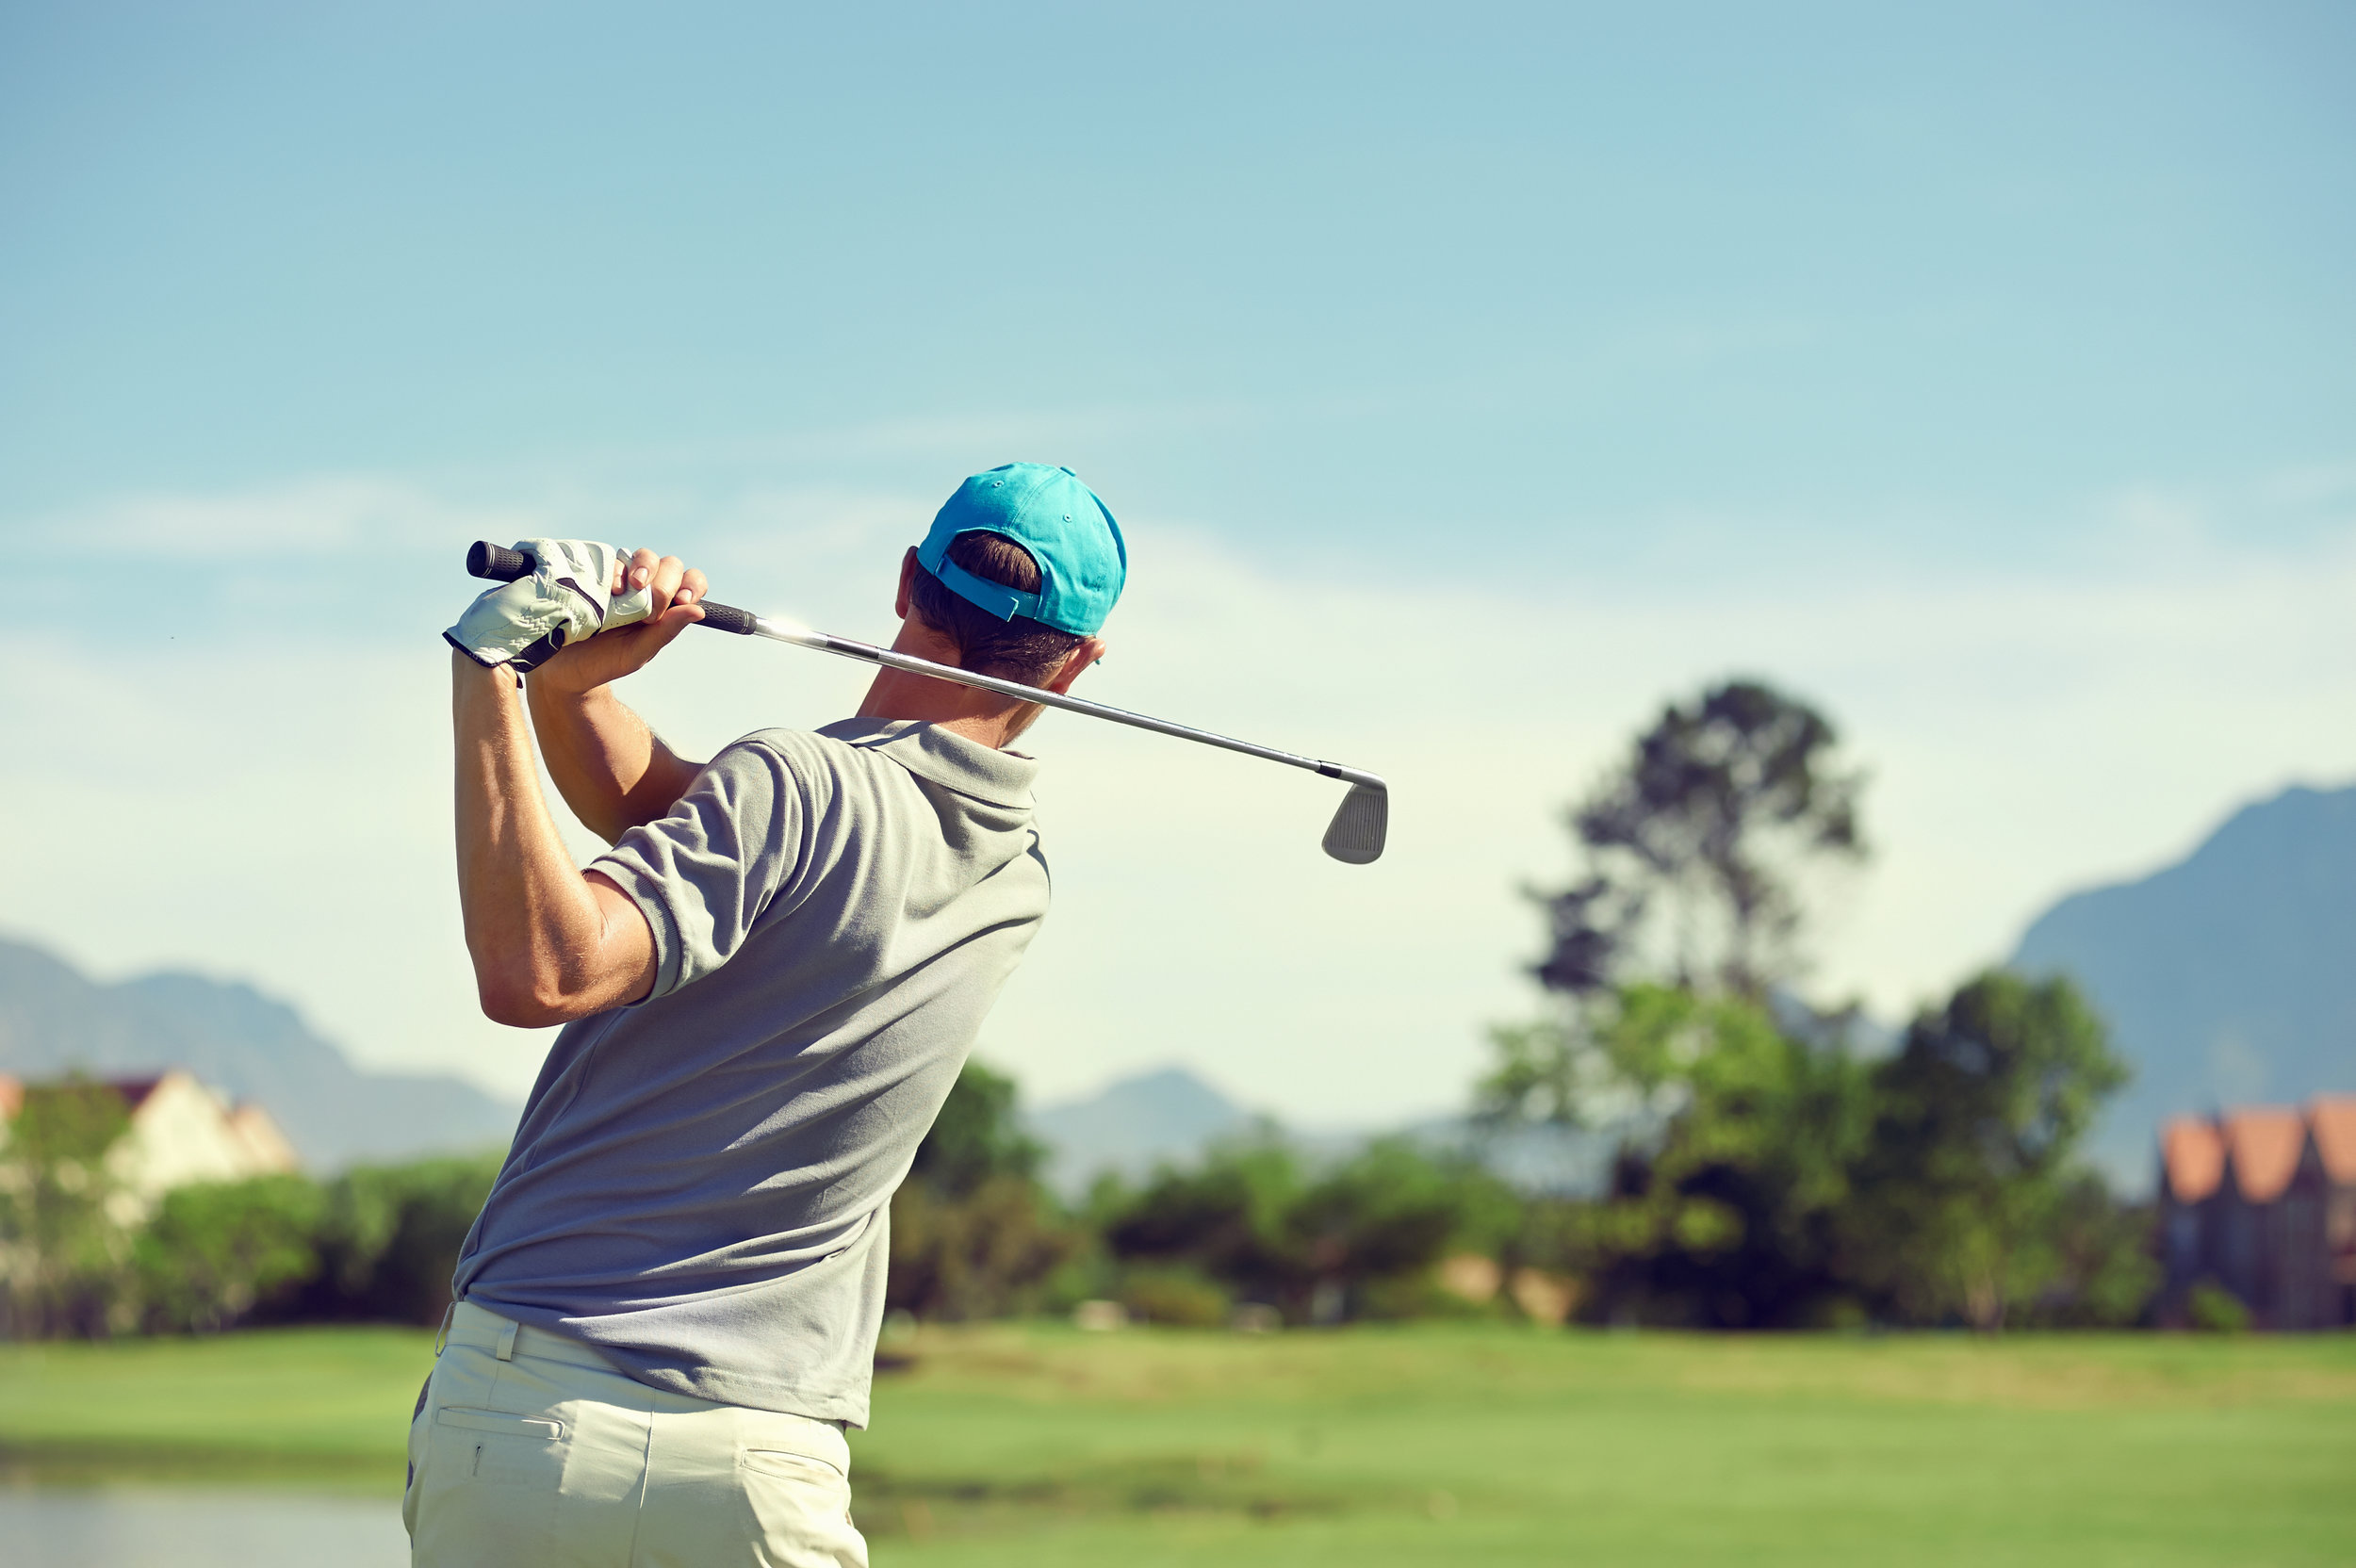 Medial Epicondylitis - Golfer's Elbow - Raleigh Hand Surgery